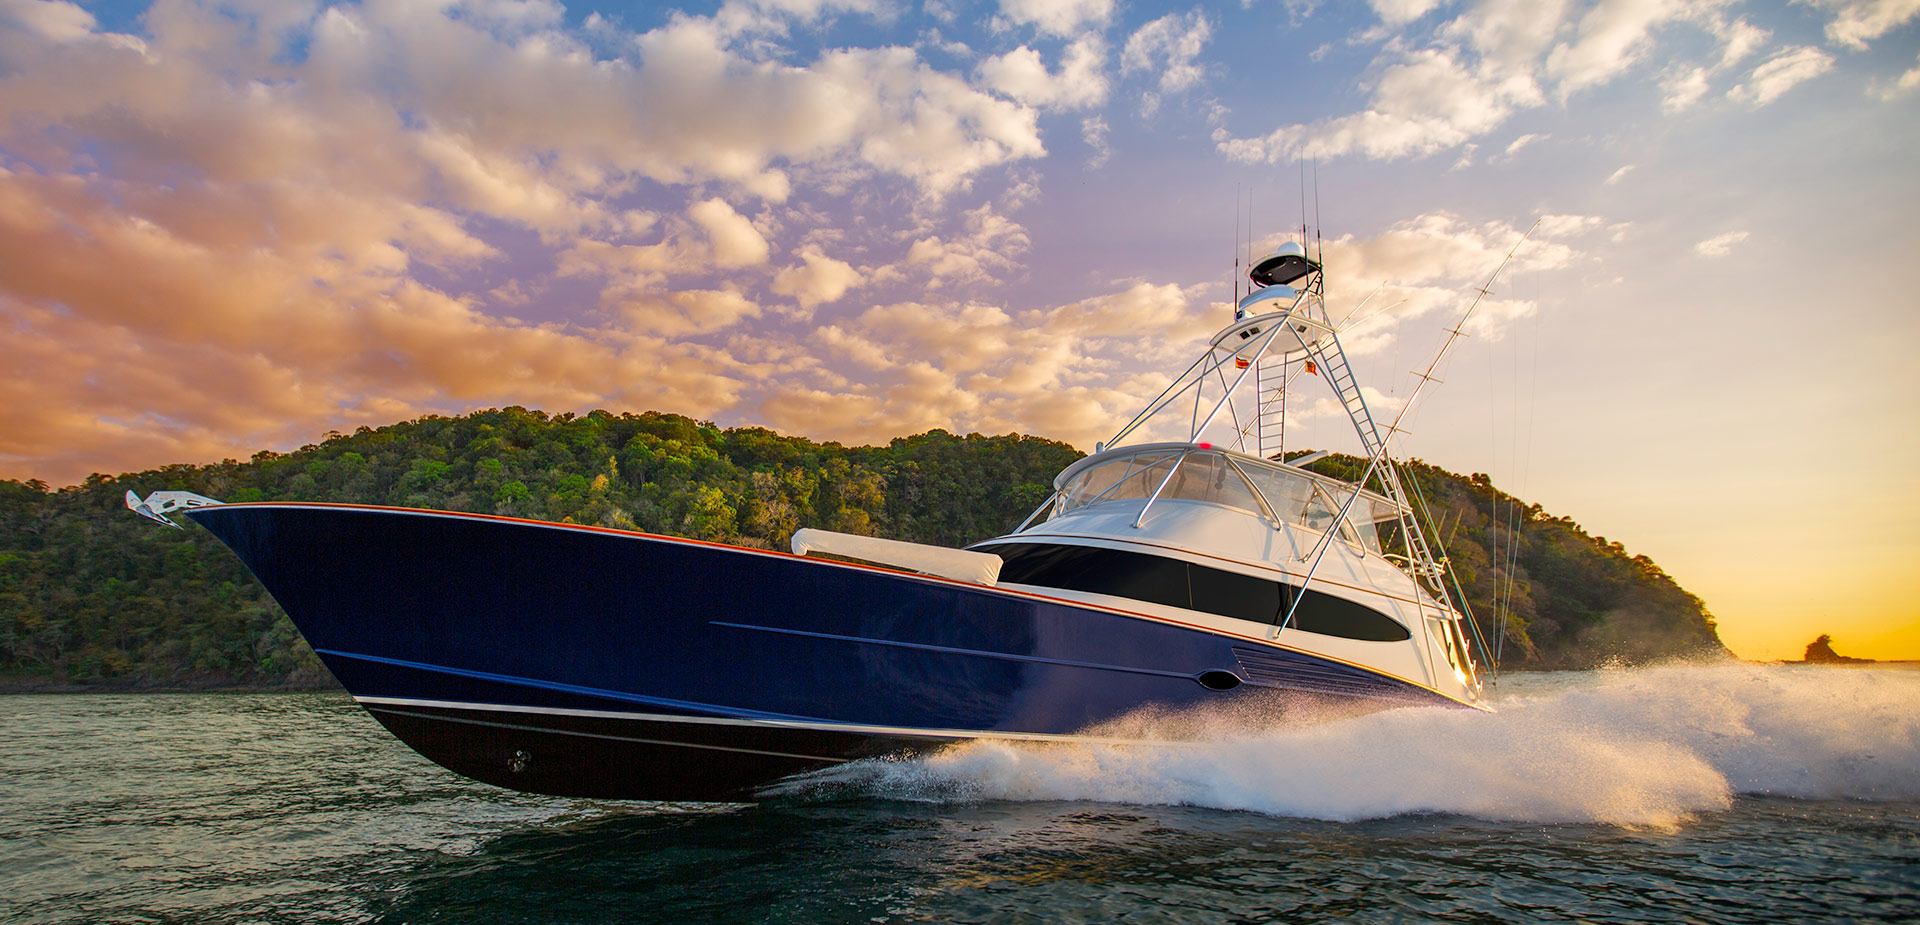 Bayliss 90 Singularis Custom Sportfishing Boat